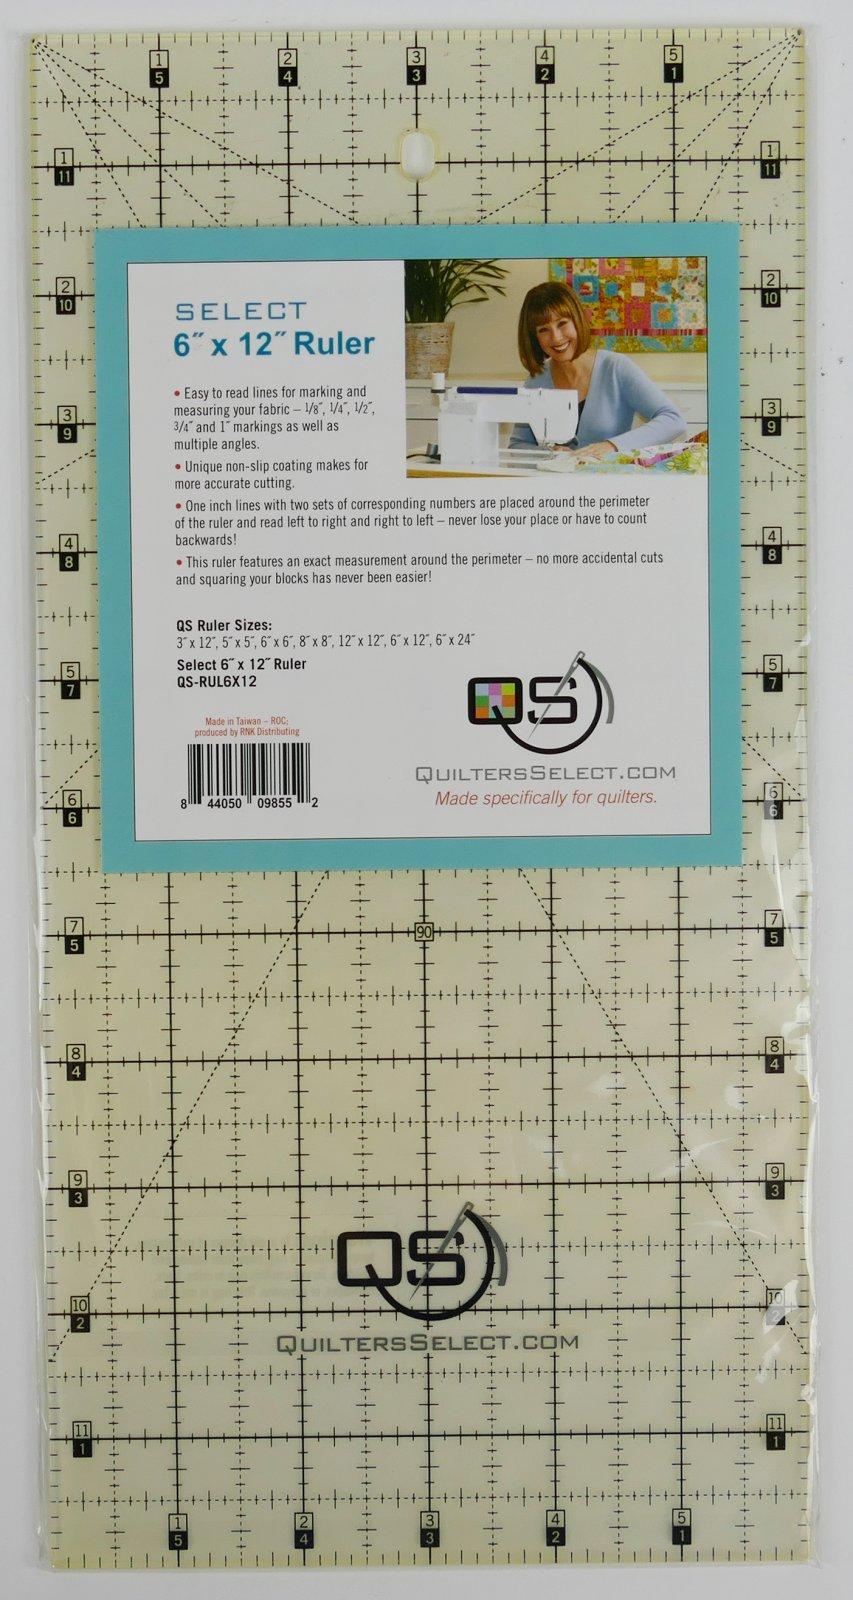 QS Select 6 x 12 Non-Slip Ruler